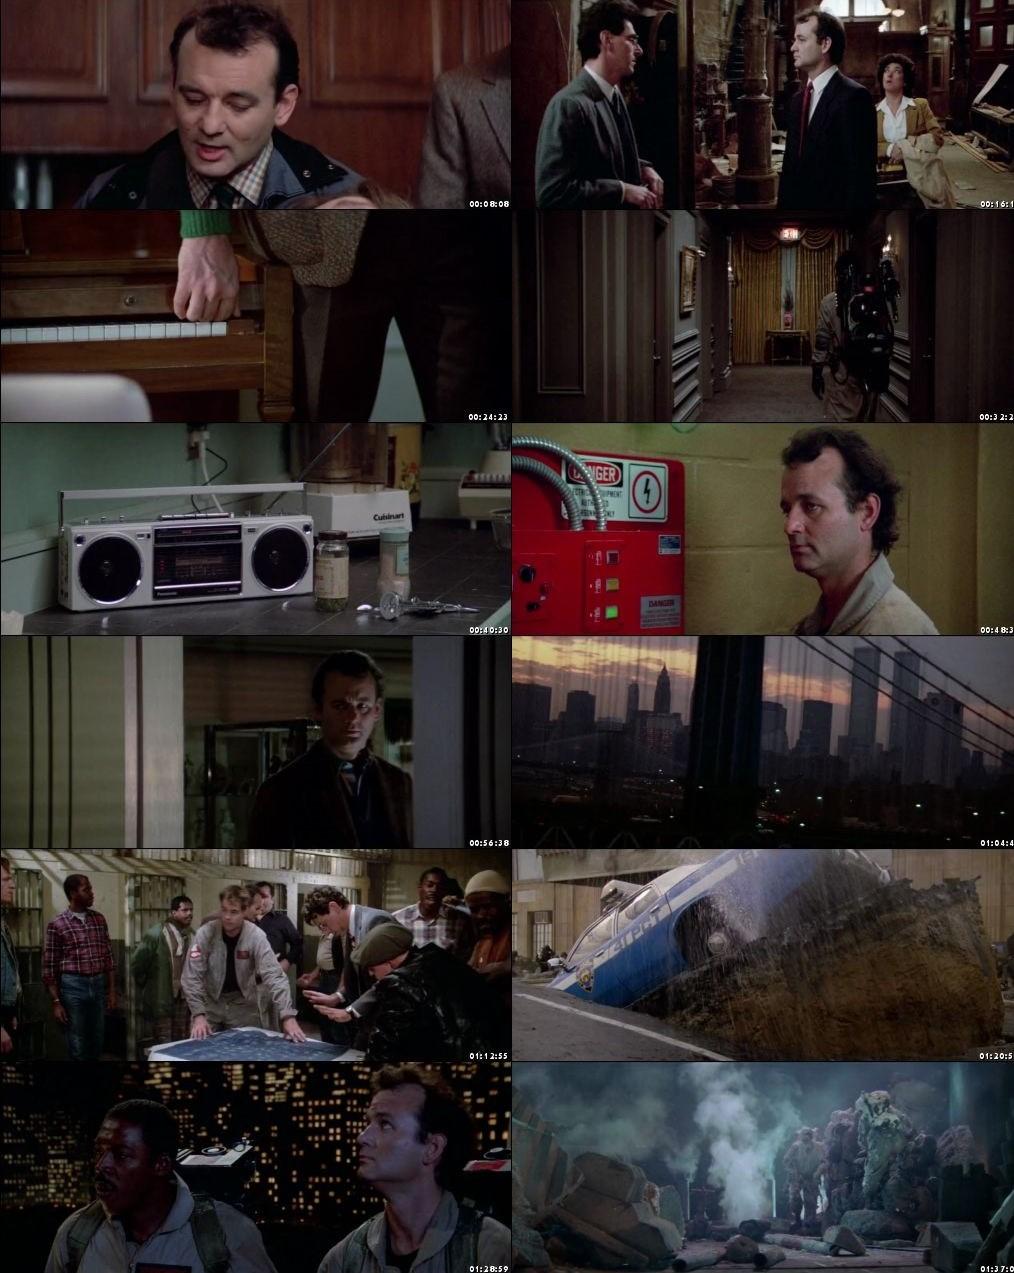 Ghostbusters 1984 Movie Screenshots